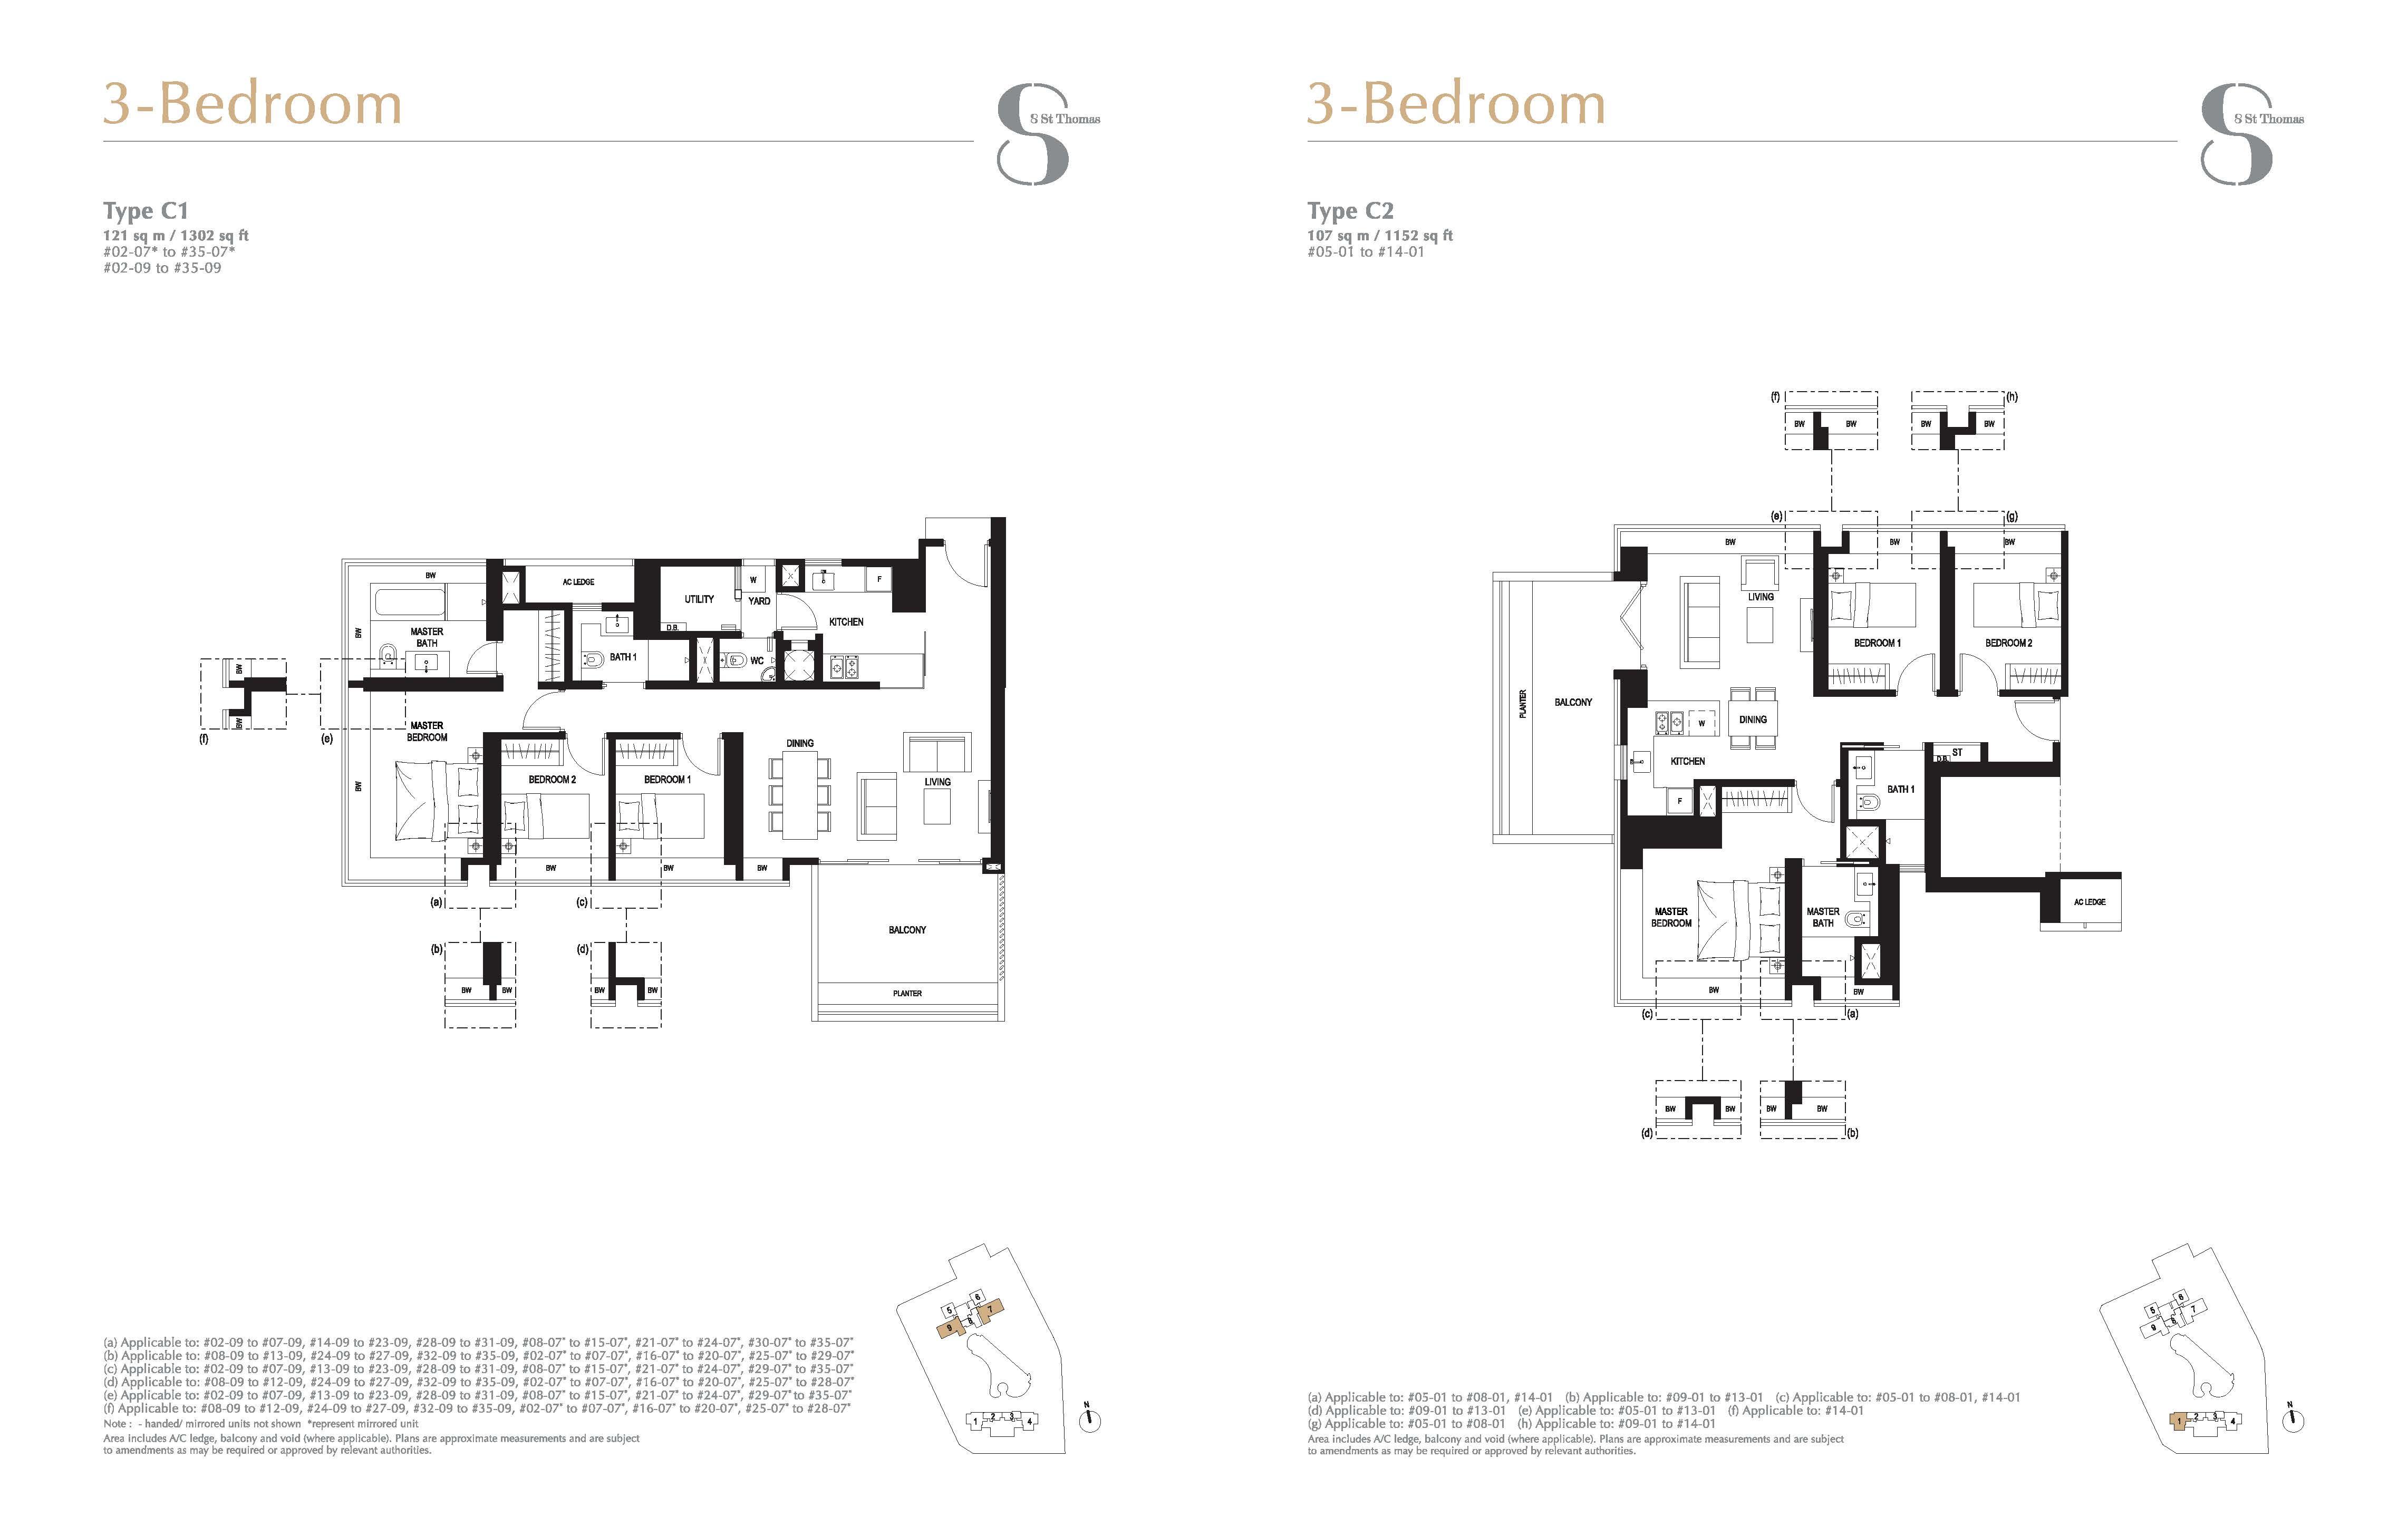 8 St Thomas Floor Plan